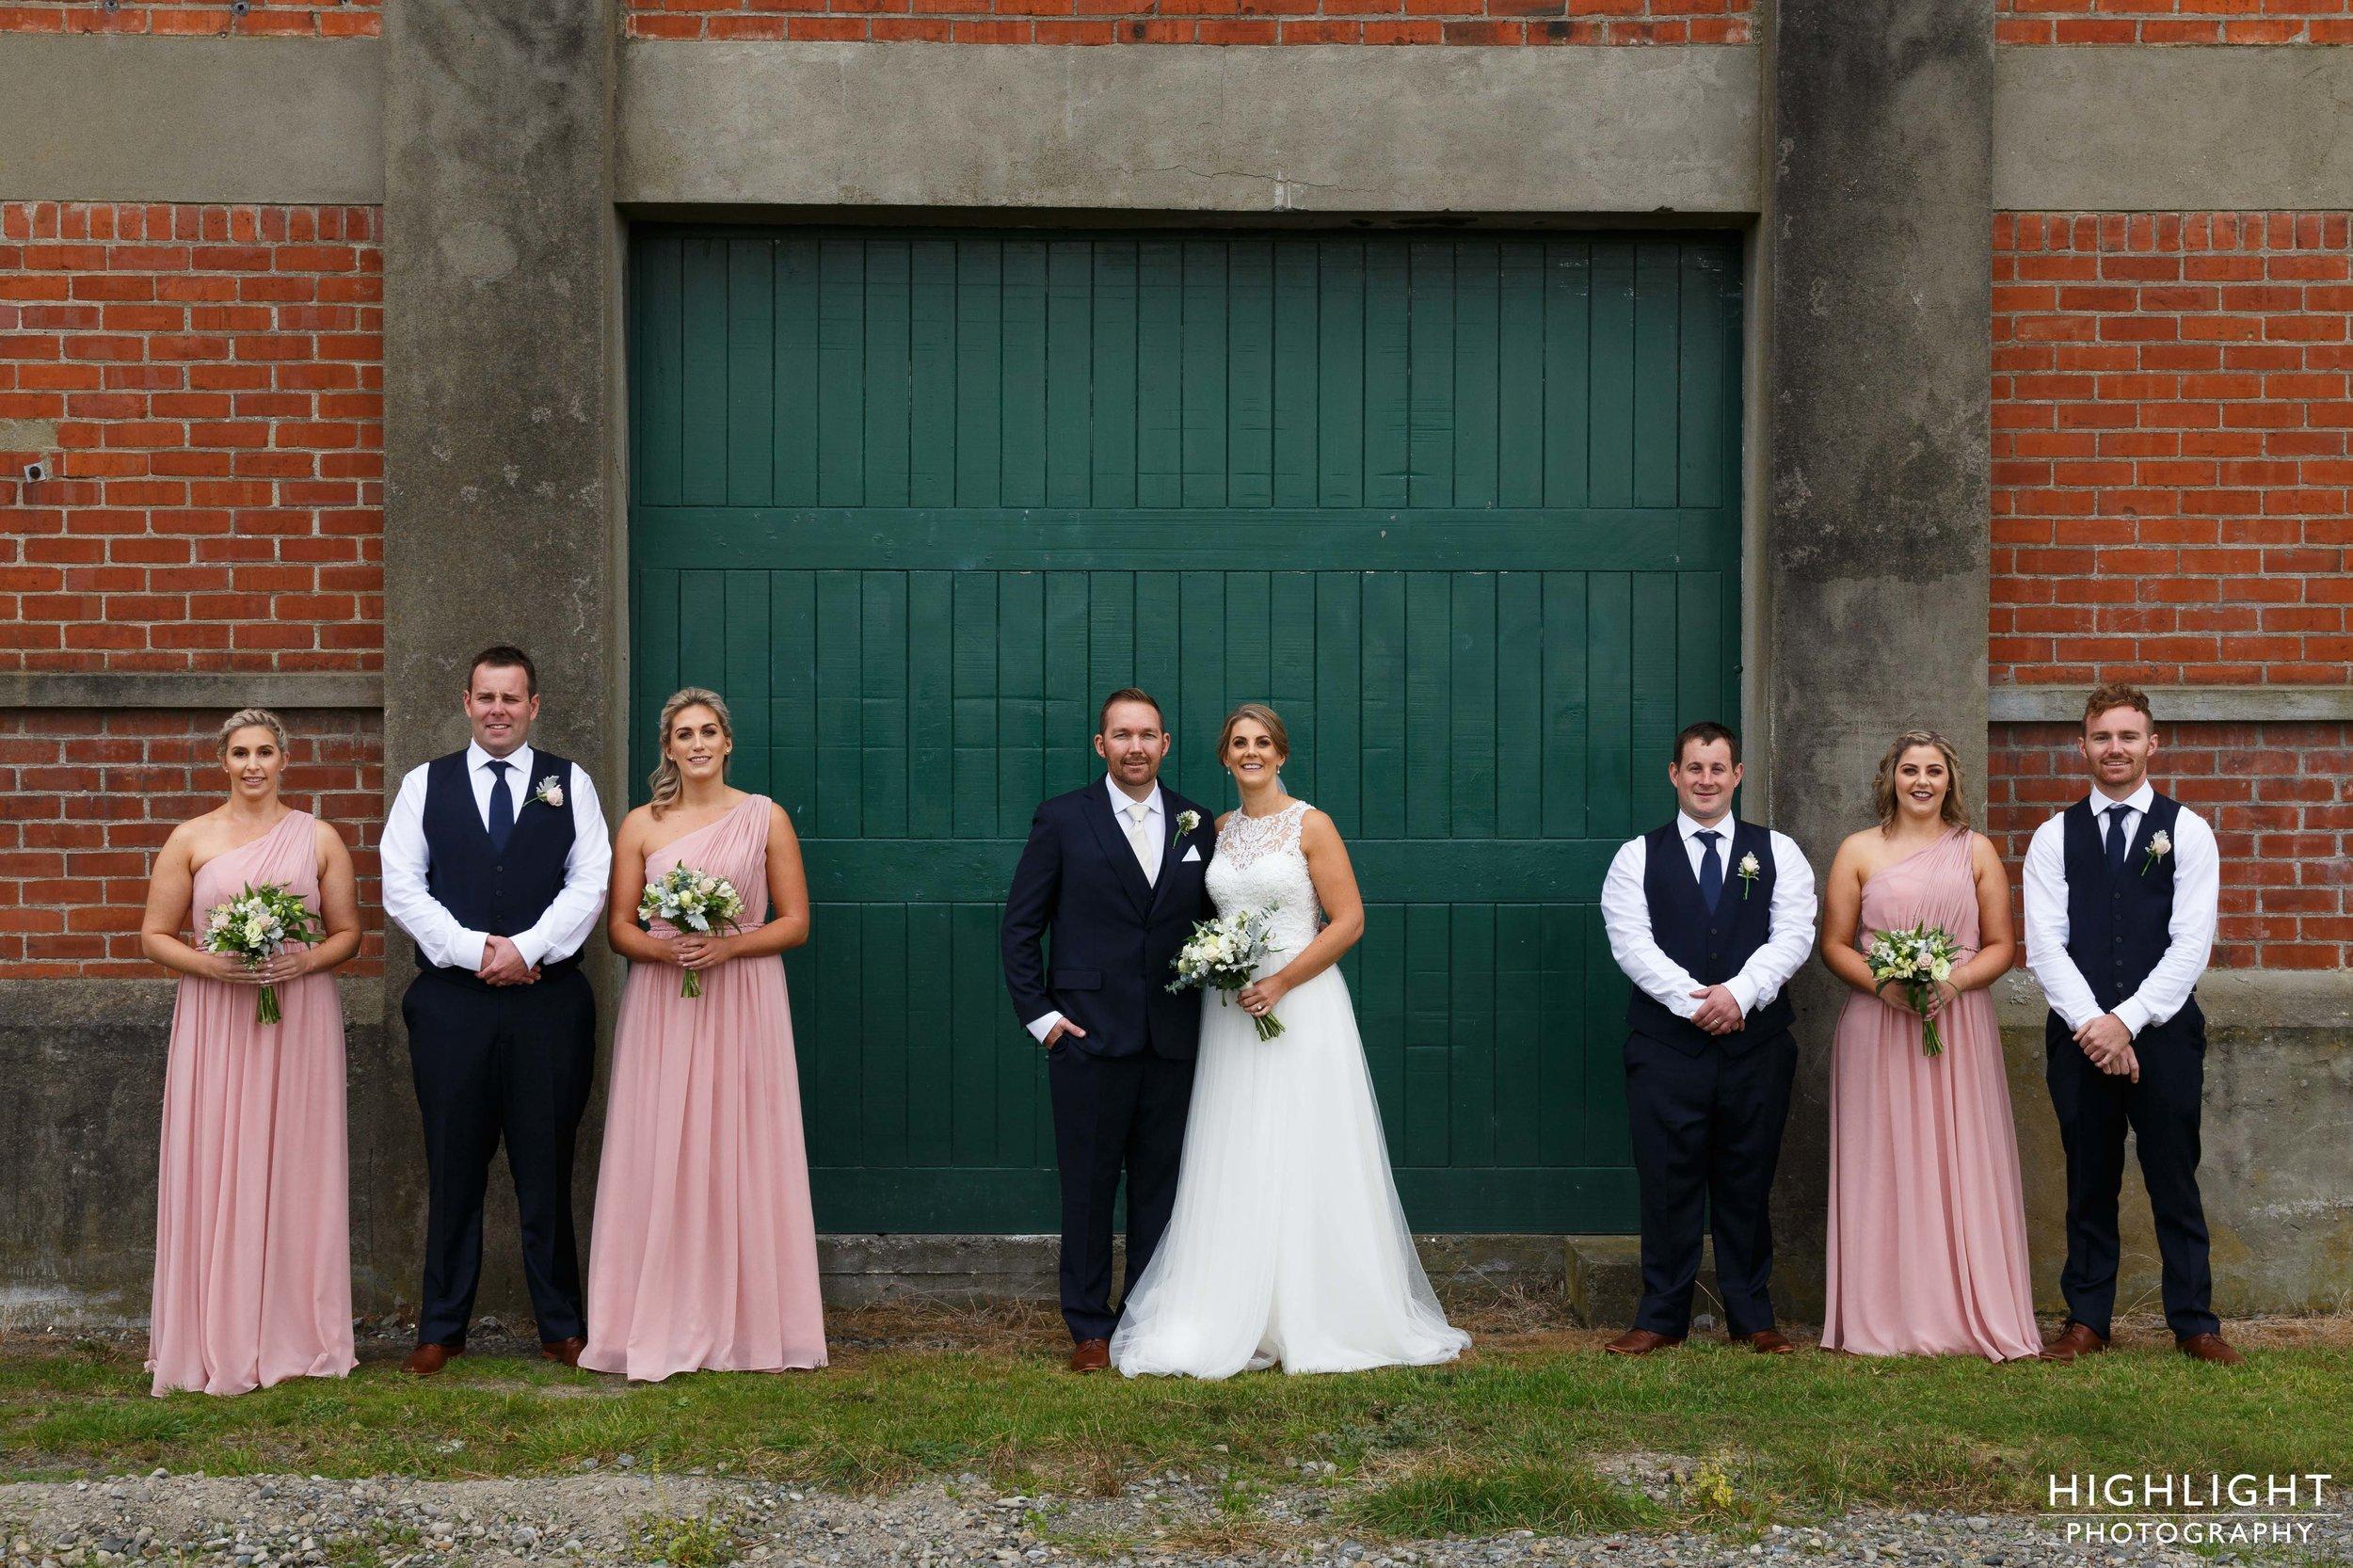 highlight-wedding-photography-palmerston-north-new-zealand-orlando-country-club-wedding-73.jpg